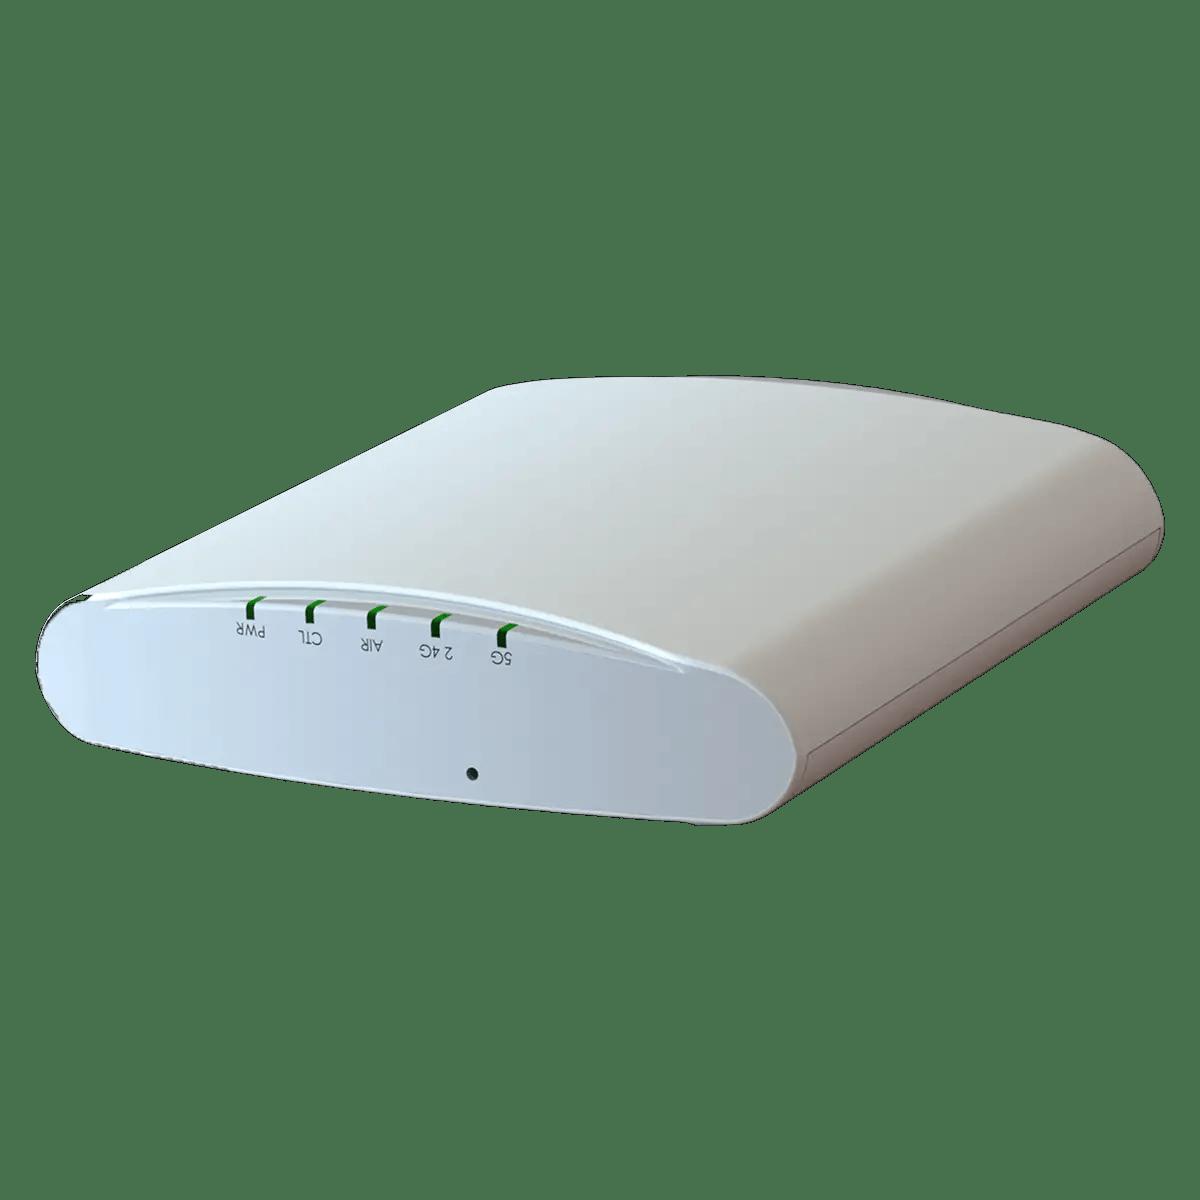 ZoneFlex R310 Default Password & Login,低価格で提供します。 同クラスの 802.11ac ワイヤレス ソリューションとは異なる ZoneFlex R310 は, 4dB の BeamFlex 利得 (統計) と最大 10 dB の干渉軽減に加え, Manuals and Reset instructions | RouterReset